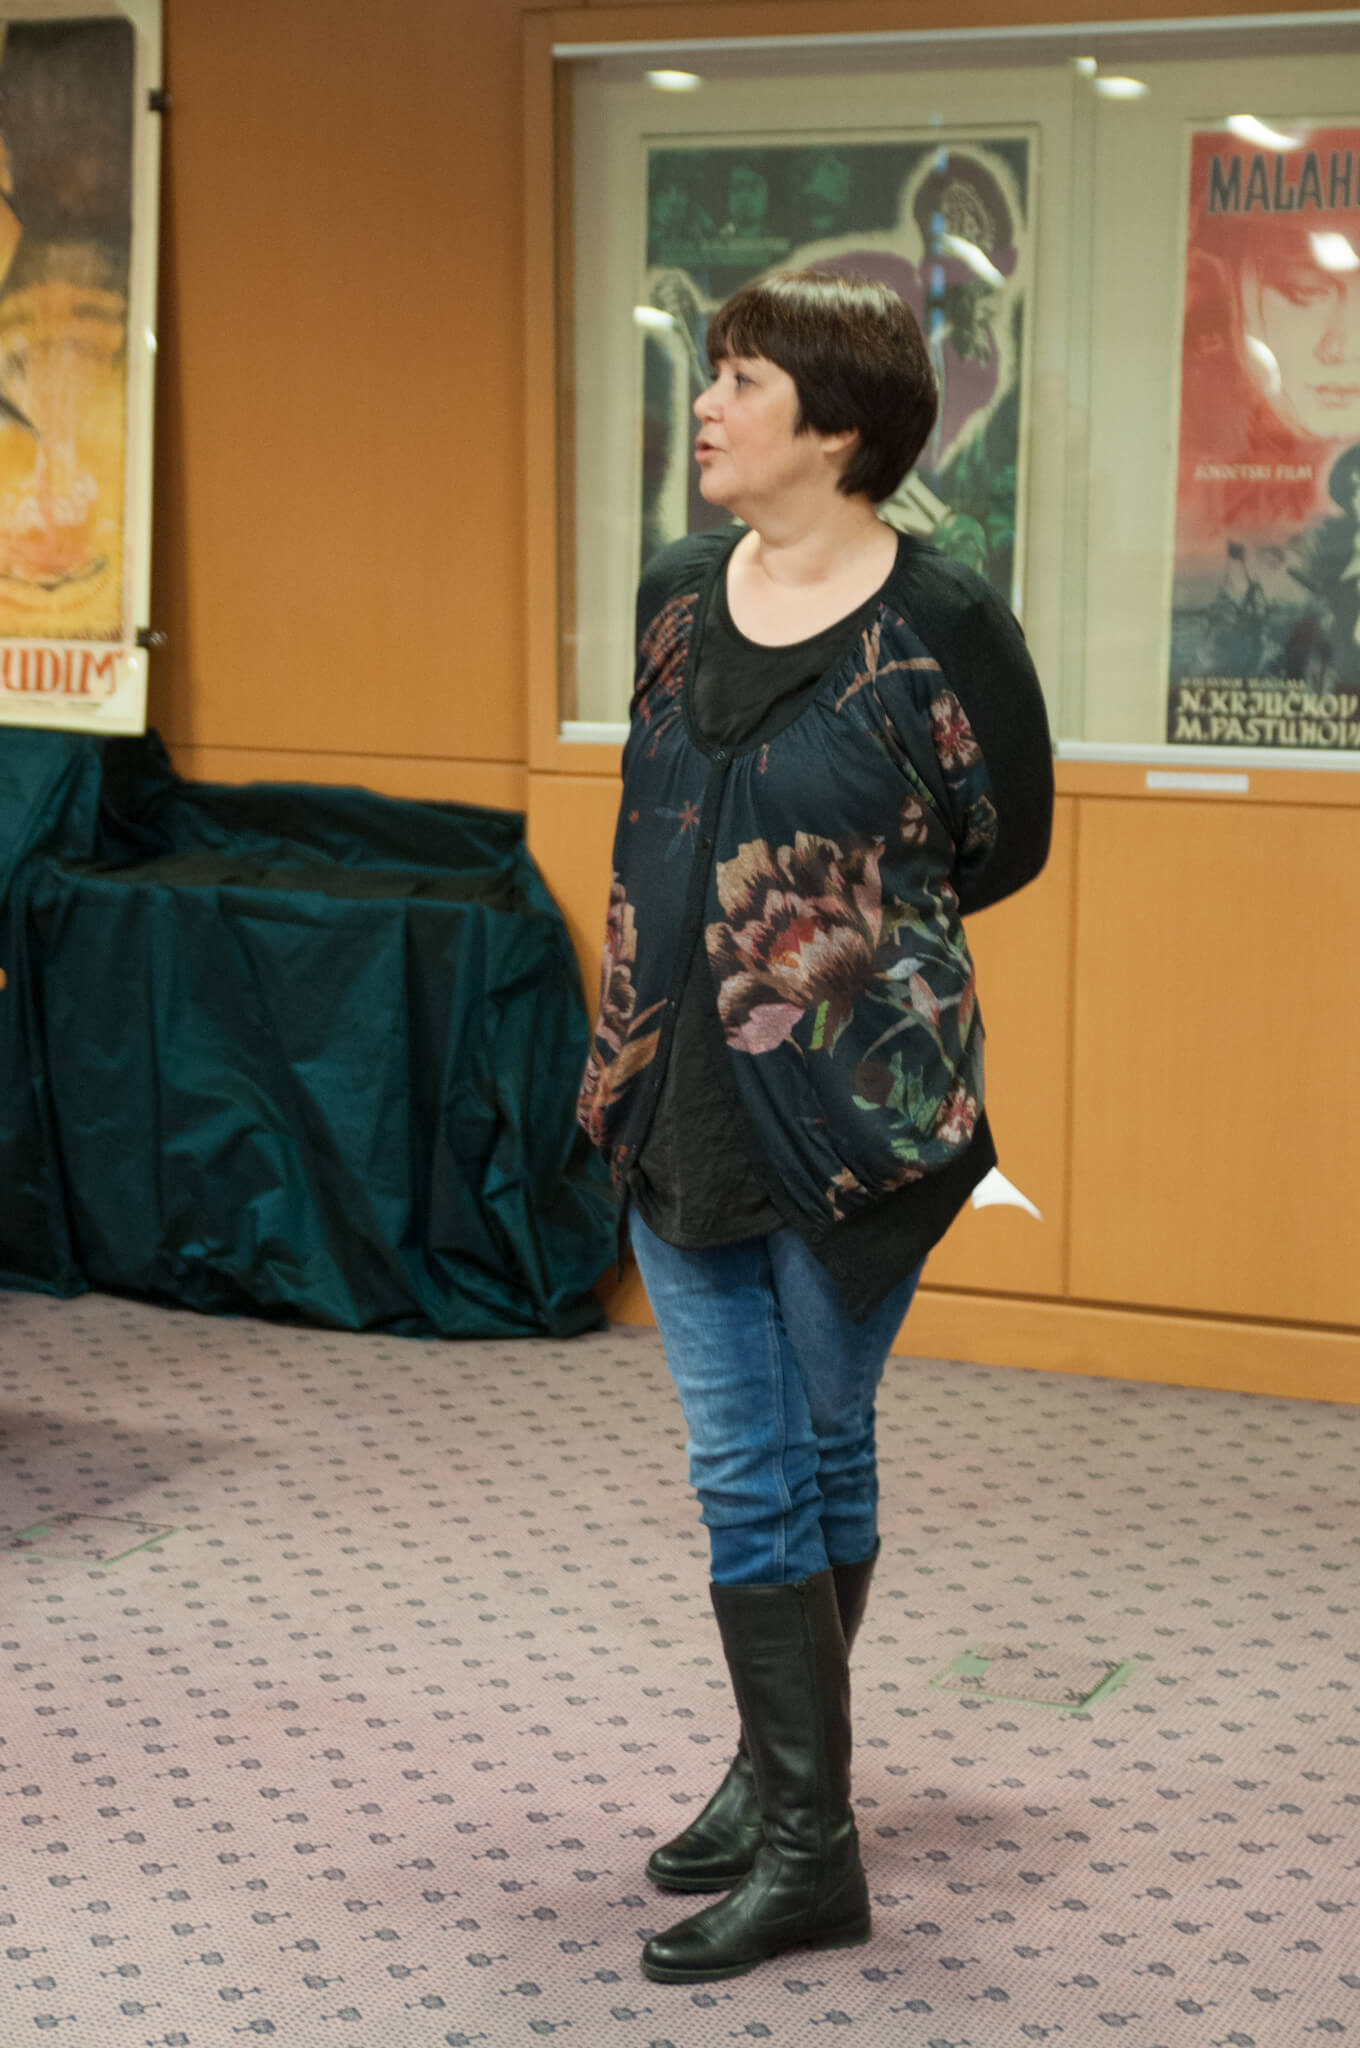 Autorica izložbe Charlotte Maria Frank, a ujedno i djelatnica Grafičke Zbirke NSK.